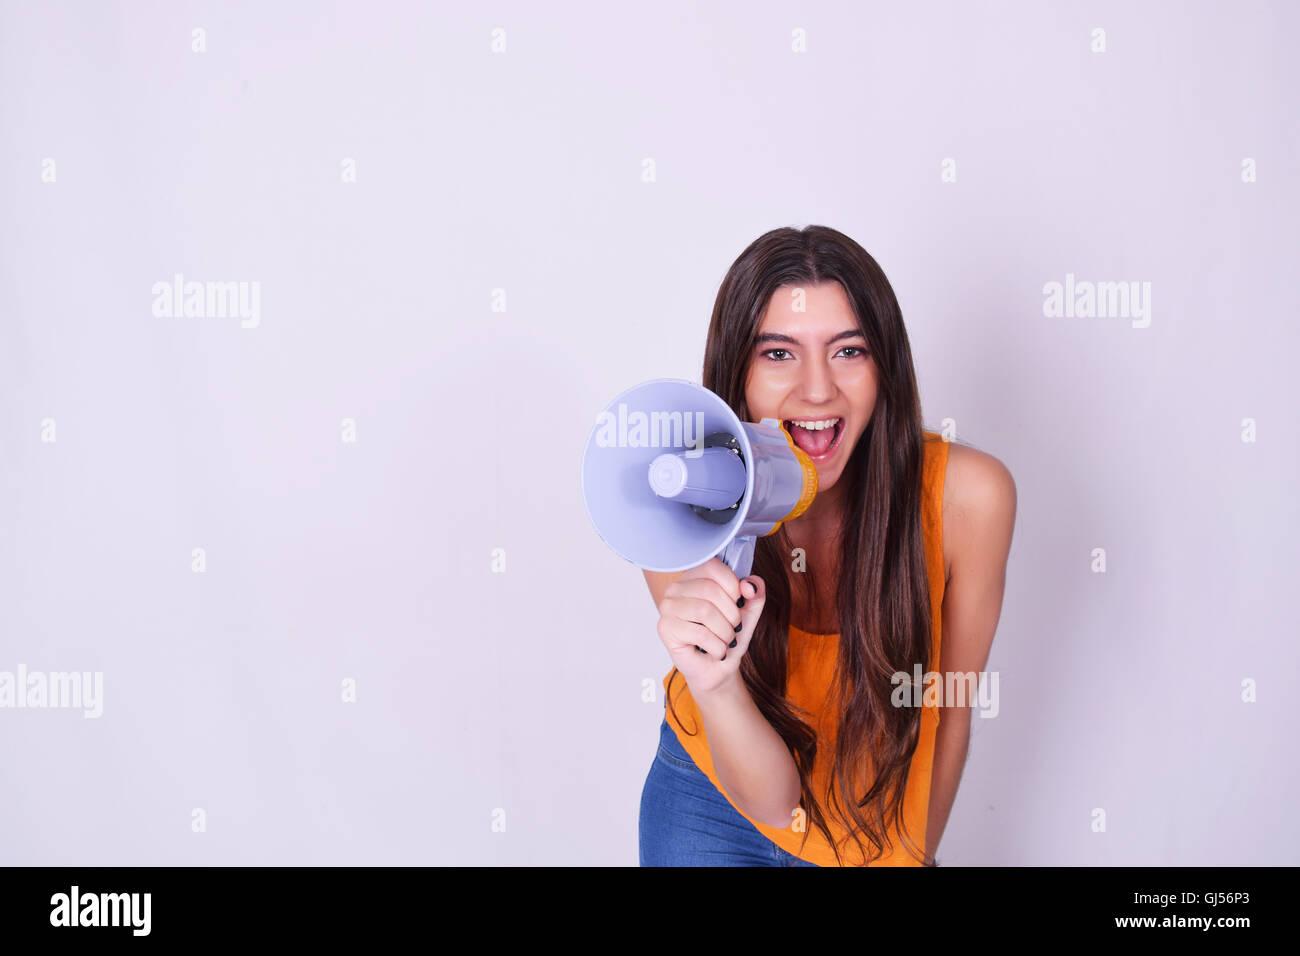 Young beautiful woman shouting through a megaphone or loudspeaker. Caucasian woman expressing. Leadership concept. - Stock Image